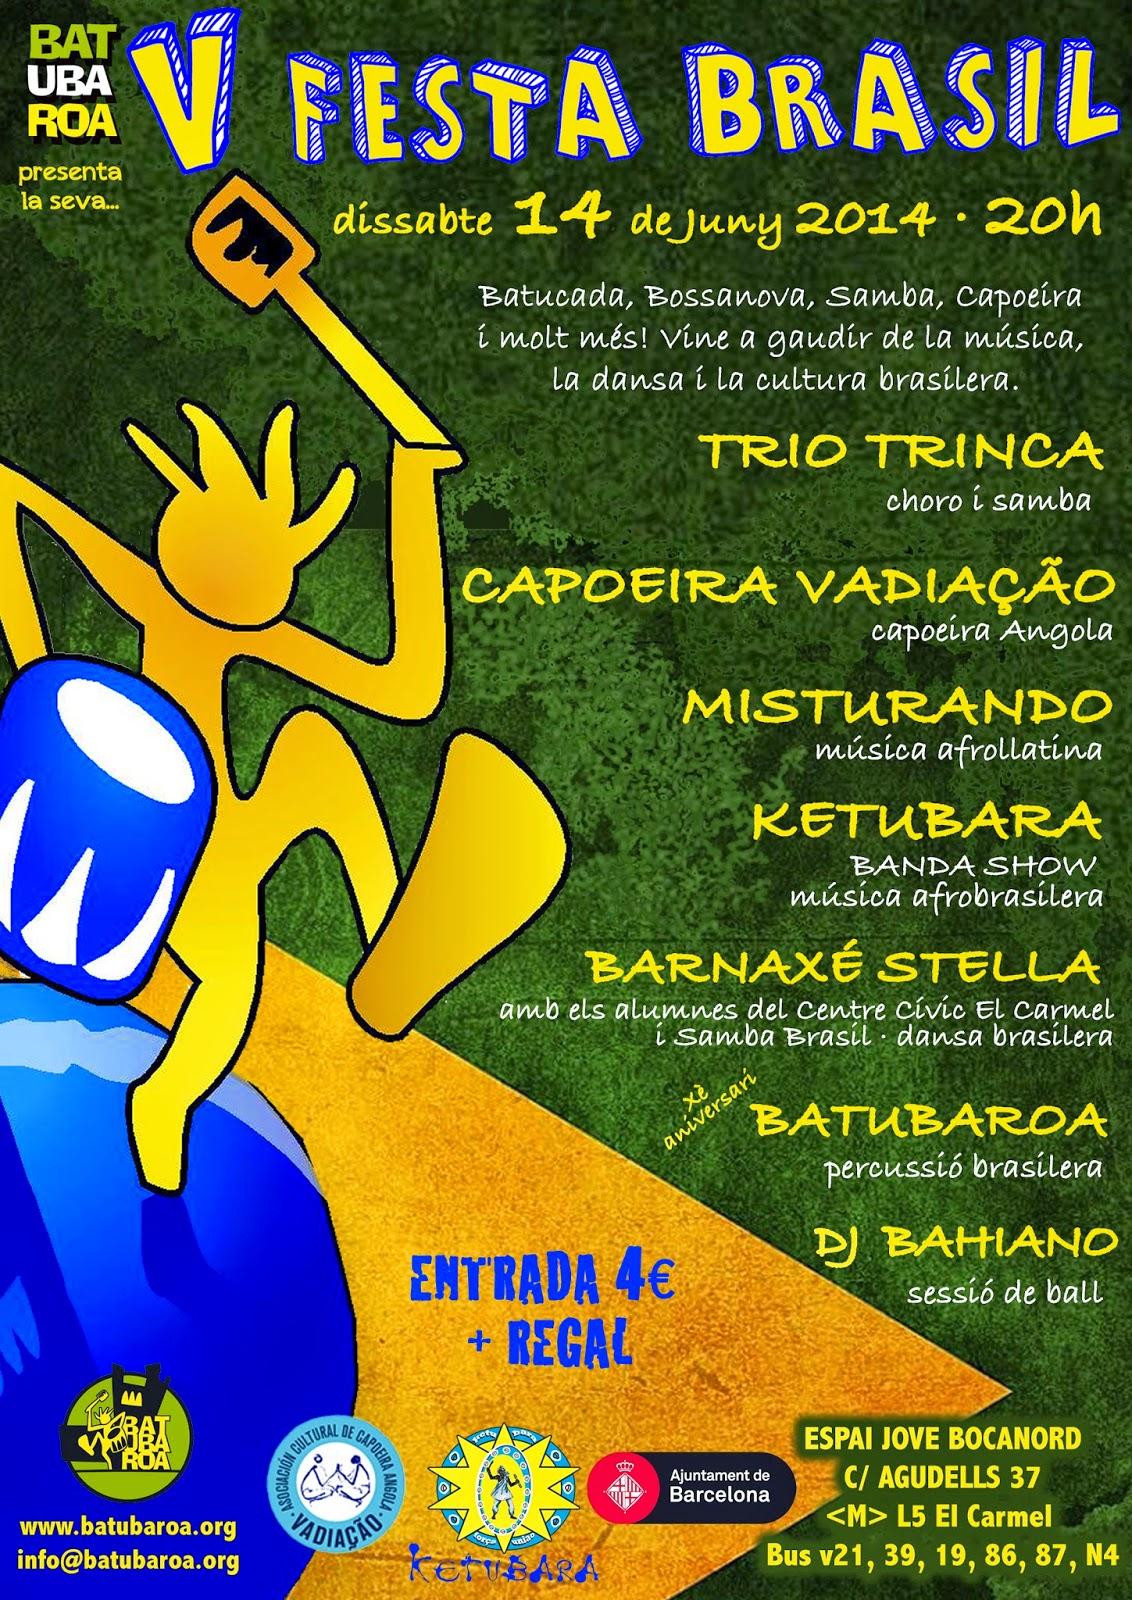 Festa Brasil Batubaroa 2014